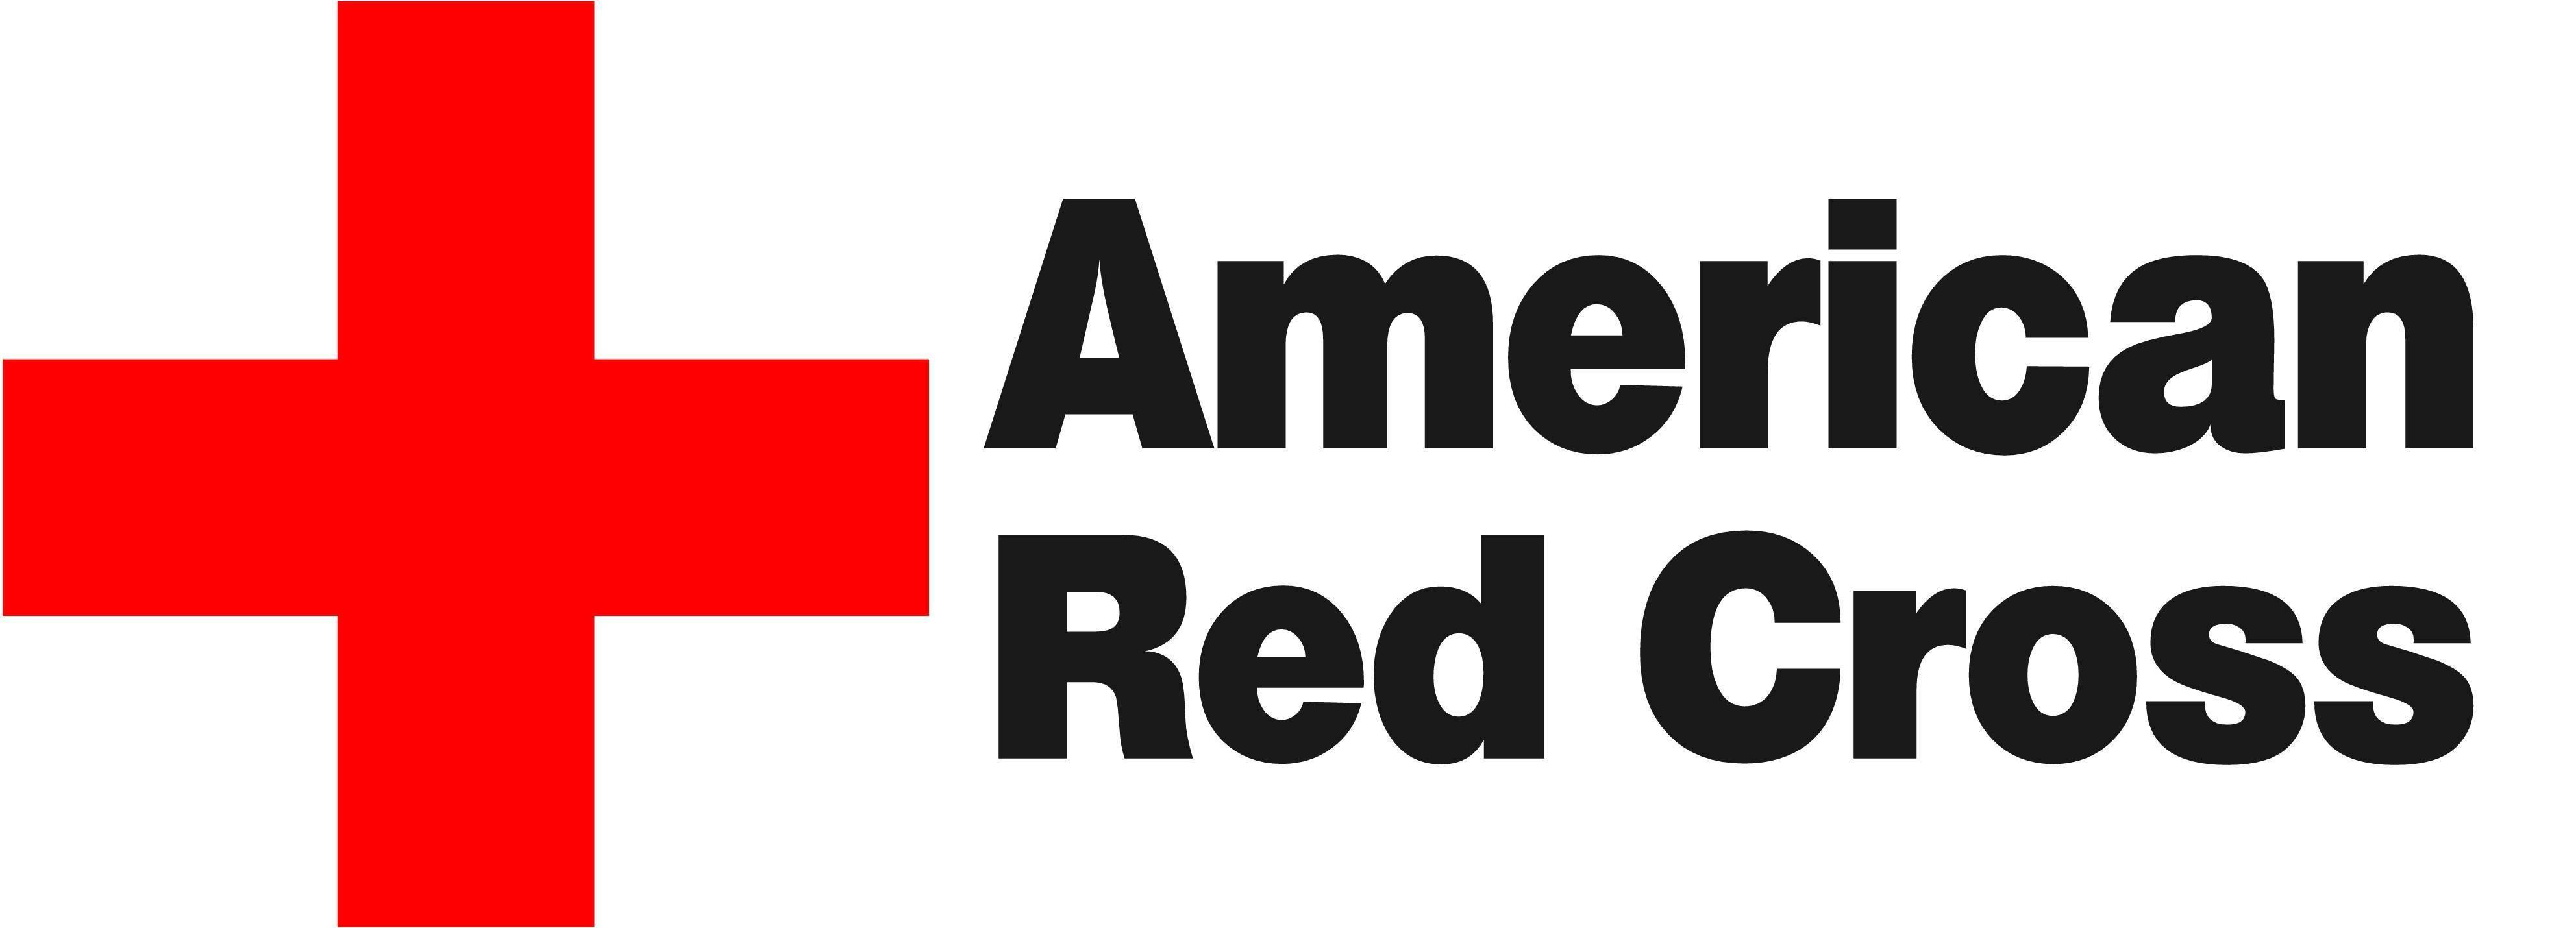 8ca389b1d005b39cd973_American-Red-Cross.jpg